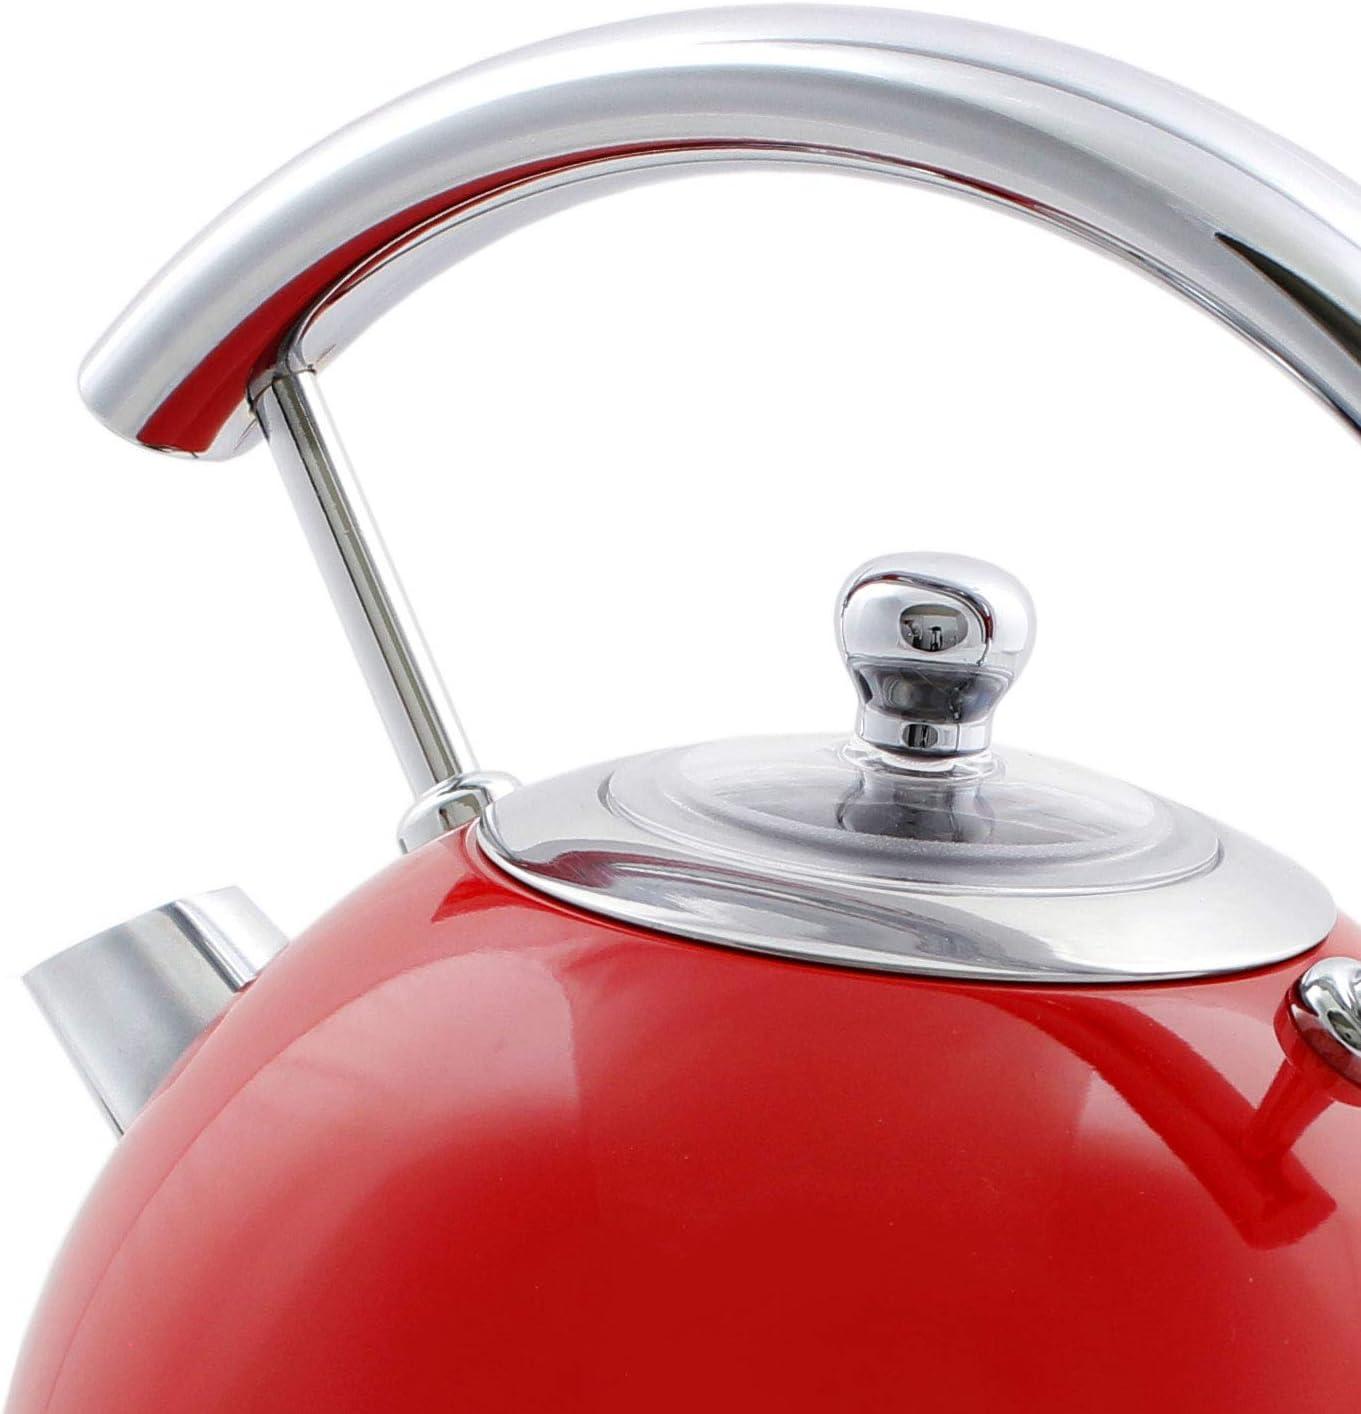 SCHNEIDER SL W 2 FR RETRO Wasserkocher 1,7 Liter Edelstahl SL-W2-FR SLW2FR ROT